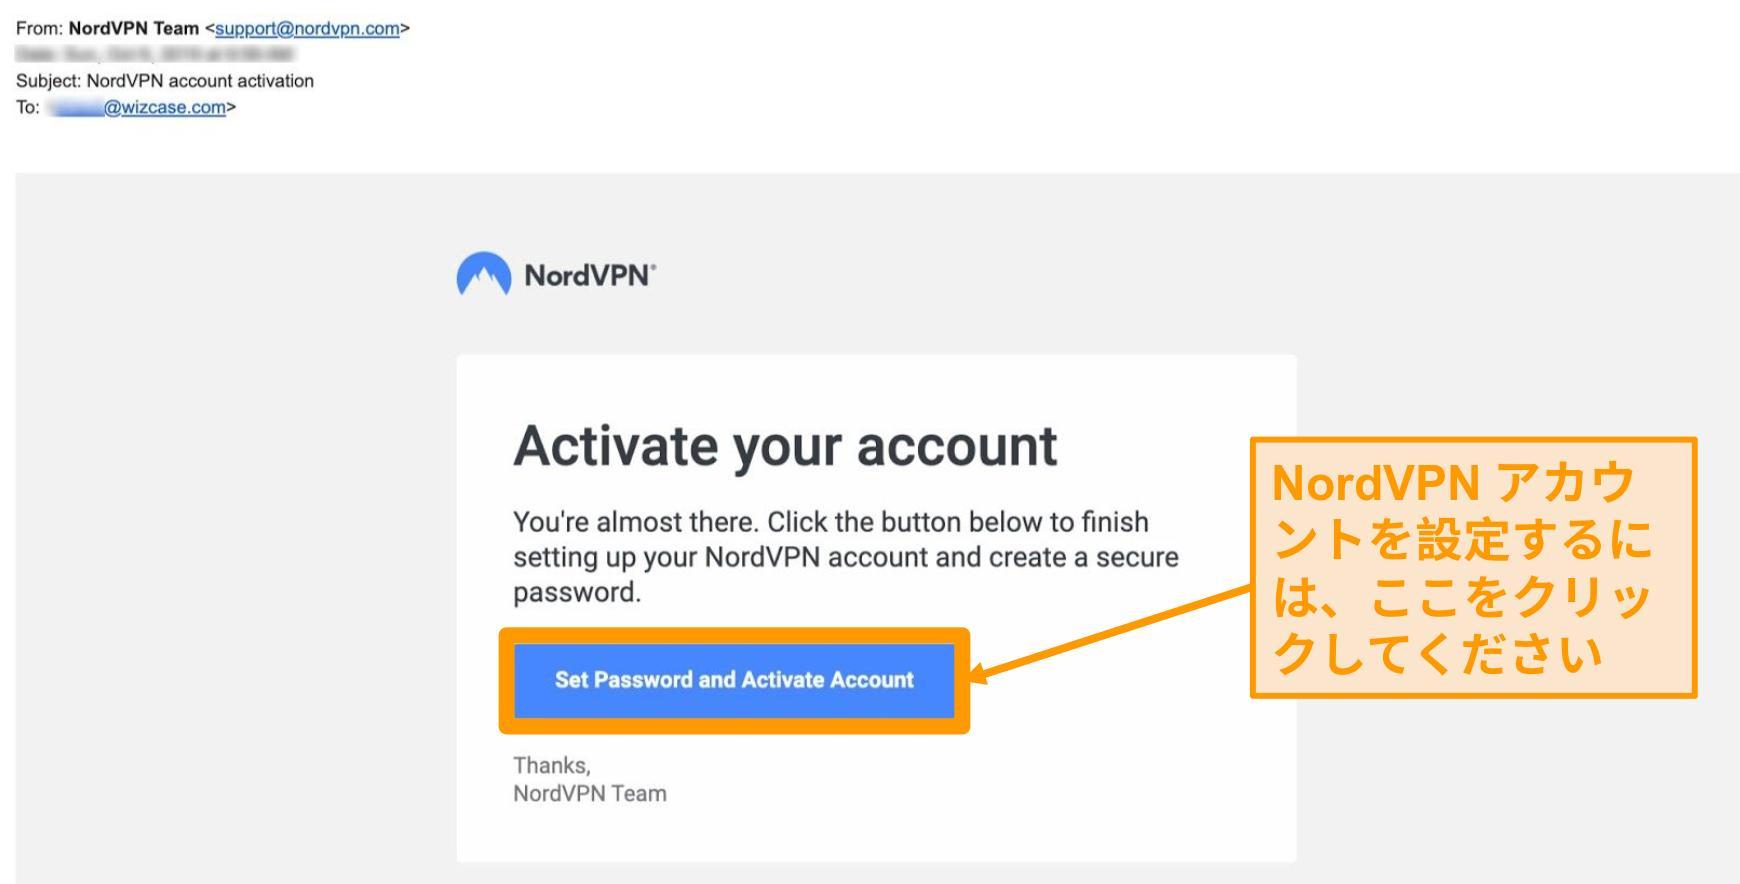 NordVPNアカウント有効化メールのスクリーンショット